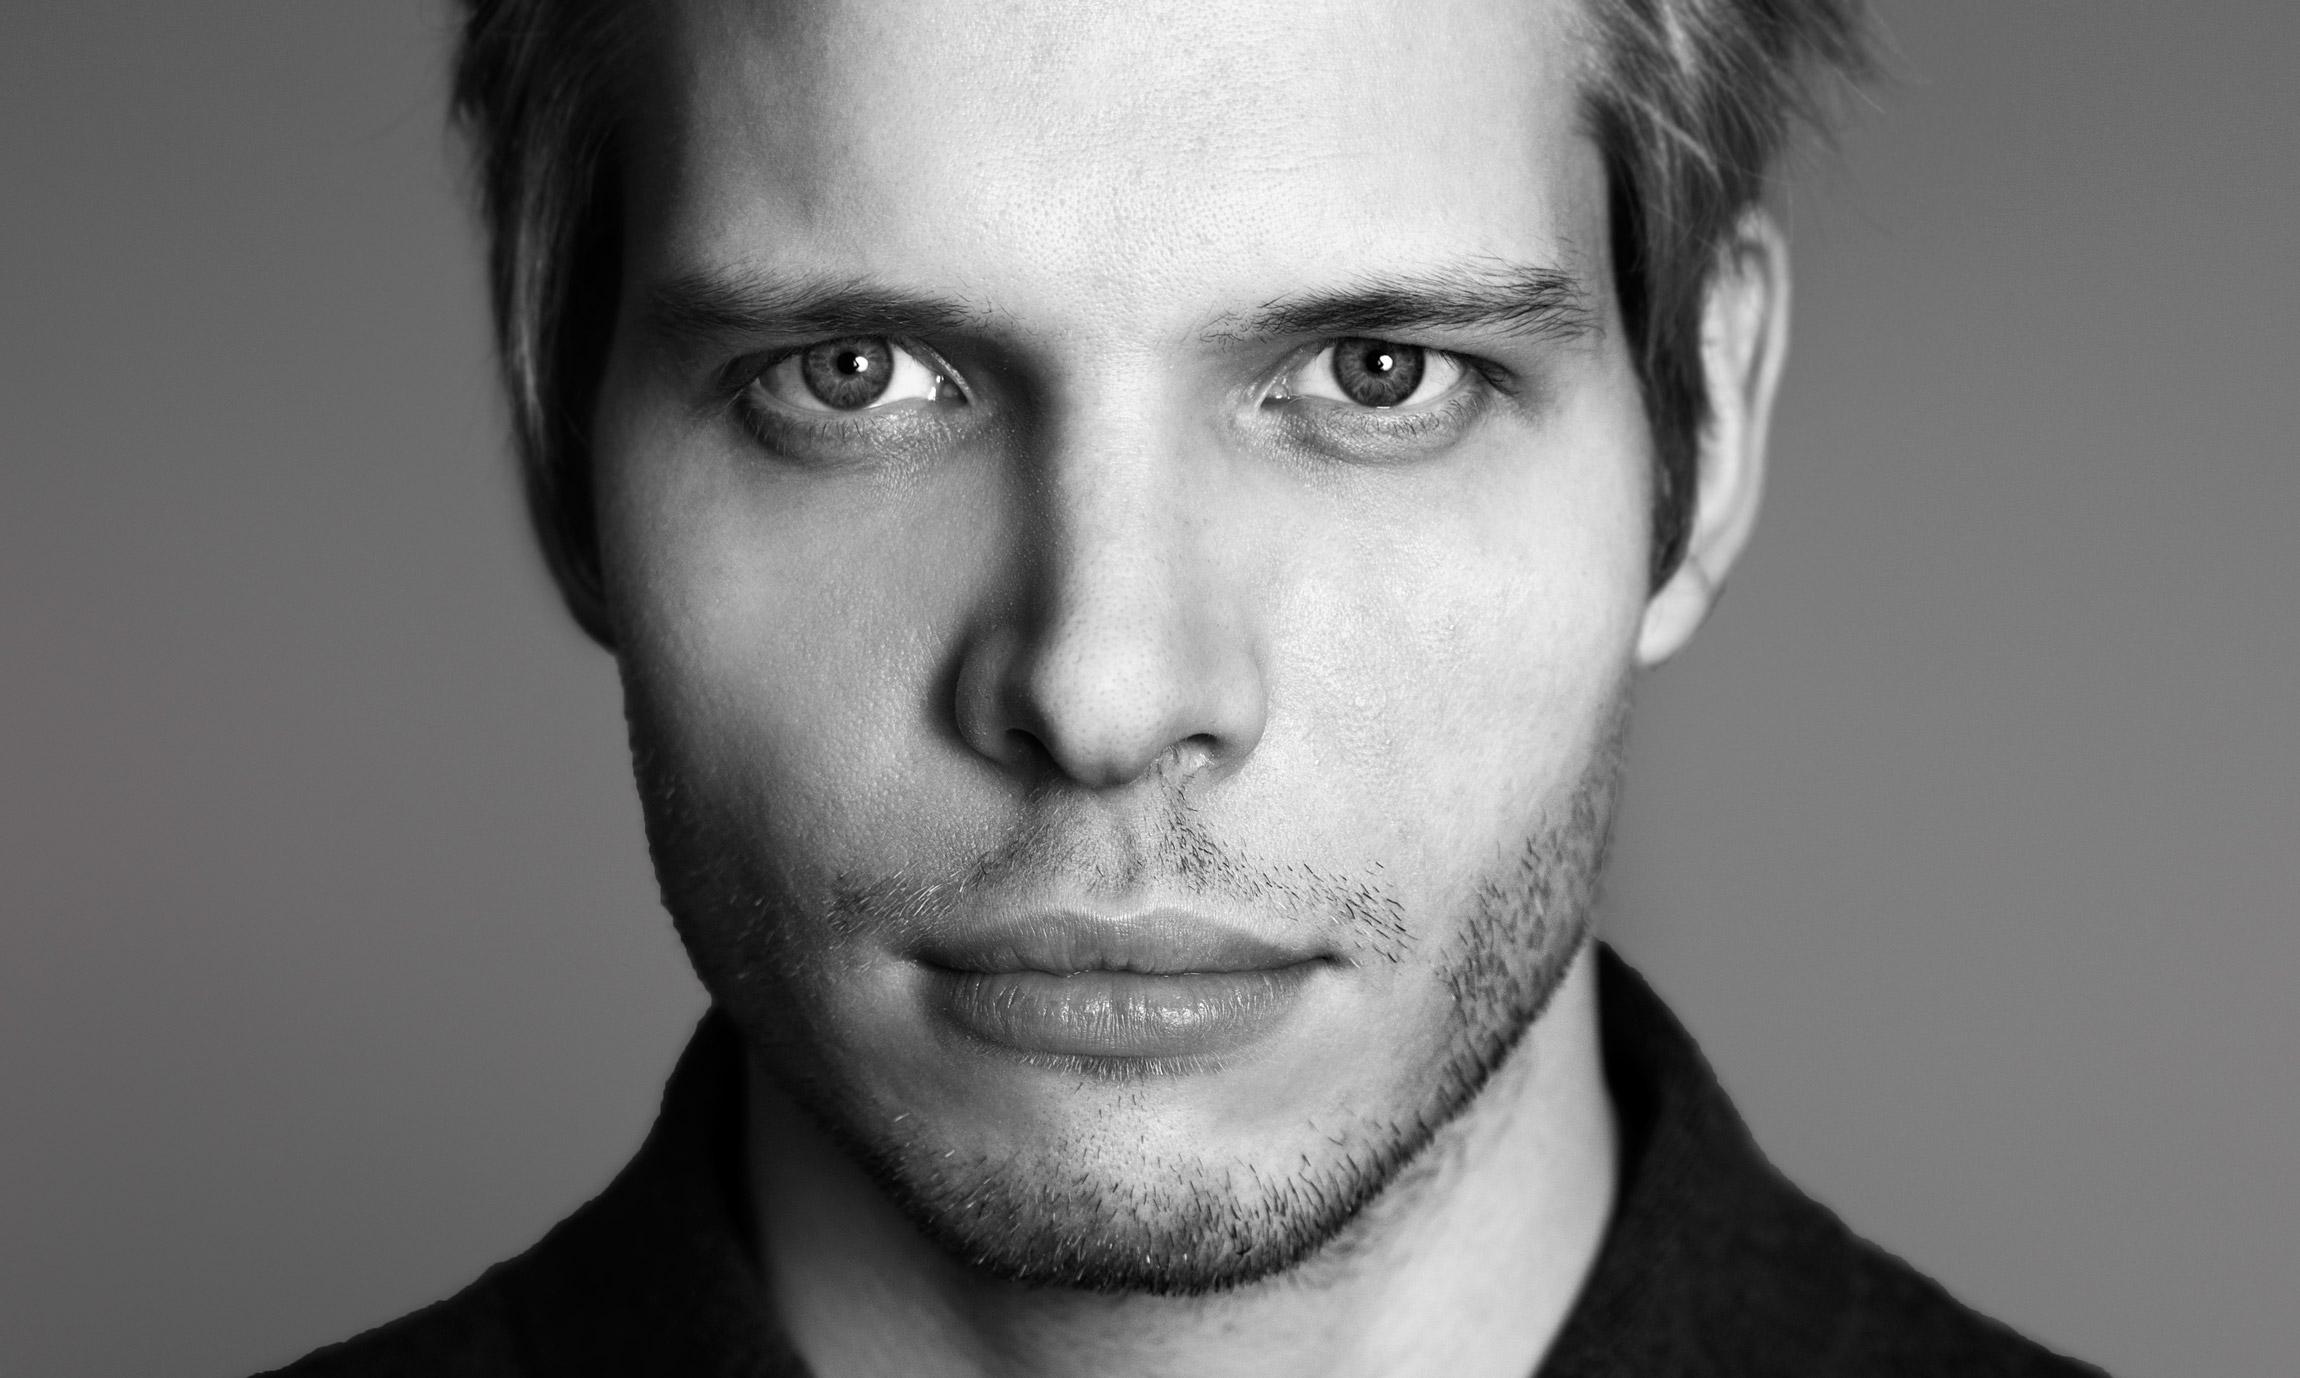 Daniel Horvath Official Website Actor